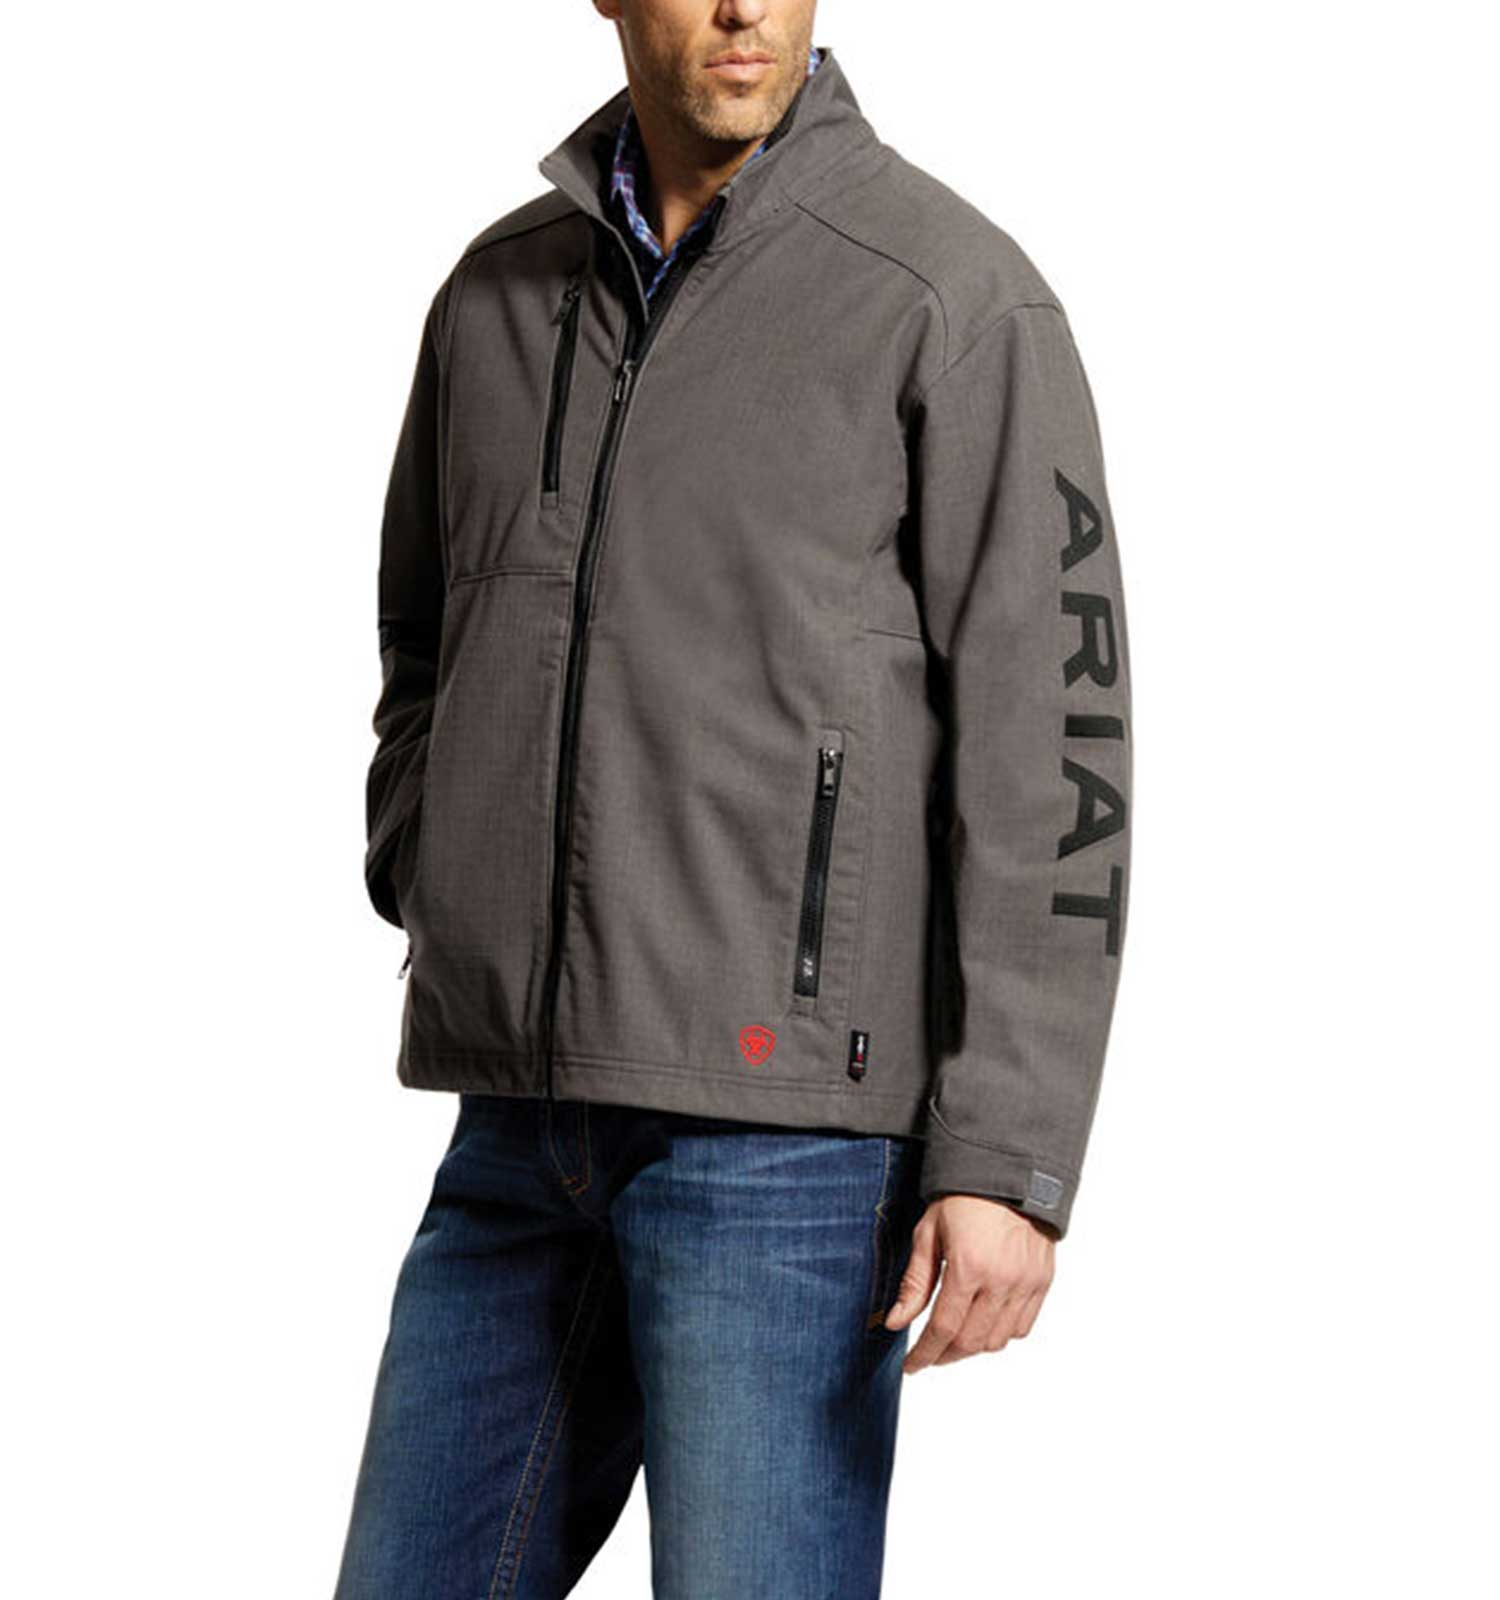 Ariat-FR-Team-Logo-Jacket-Gray-Front